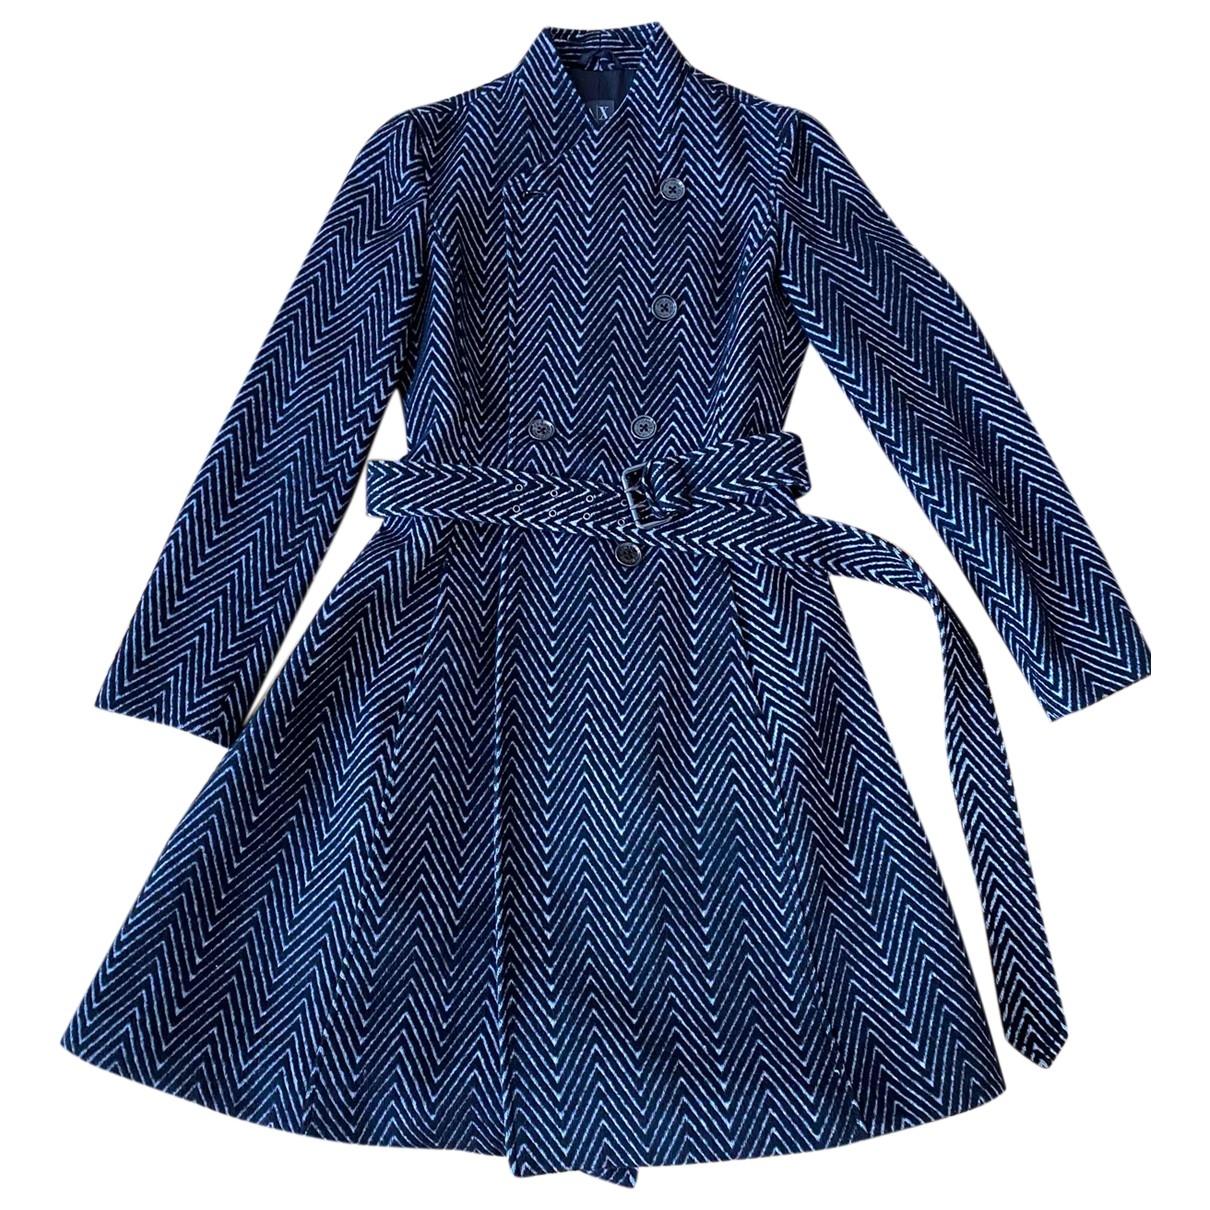 Emporio Armani \N Black coat for Women M International